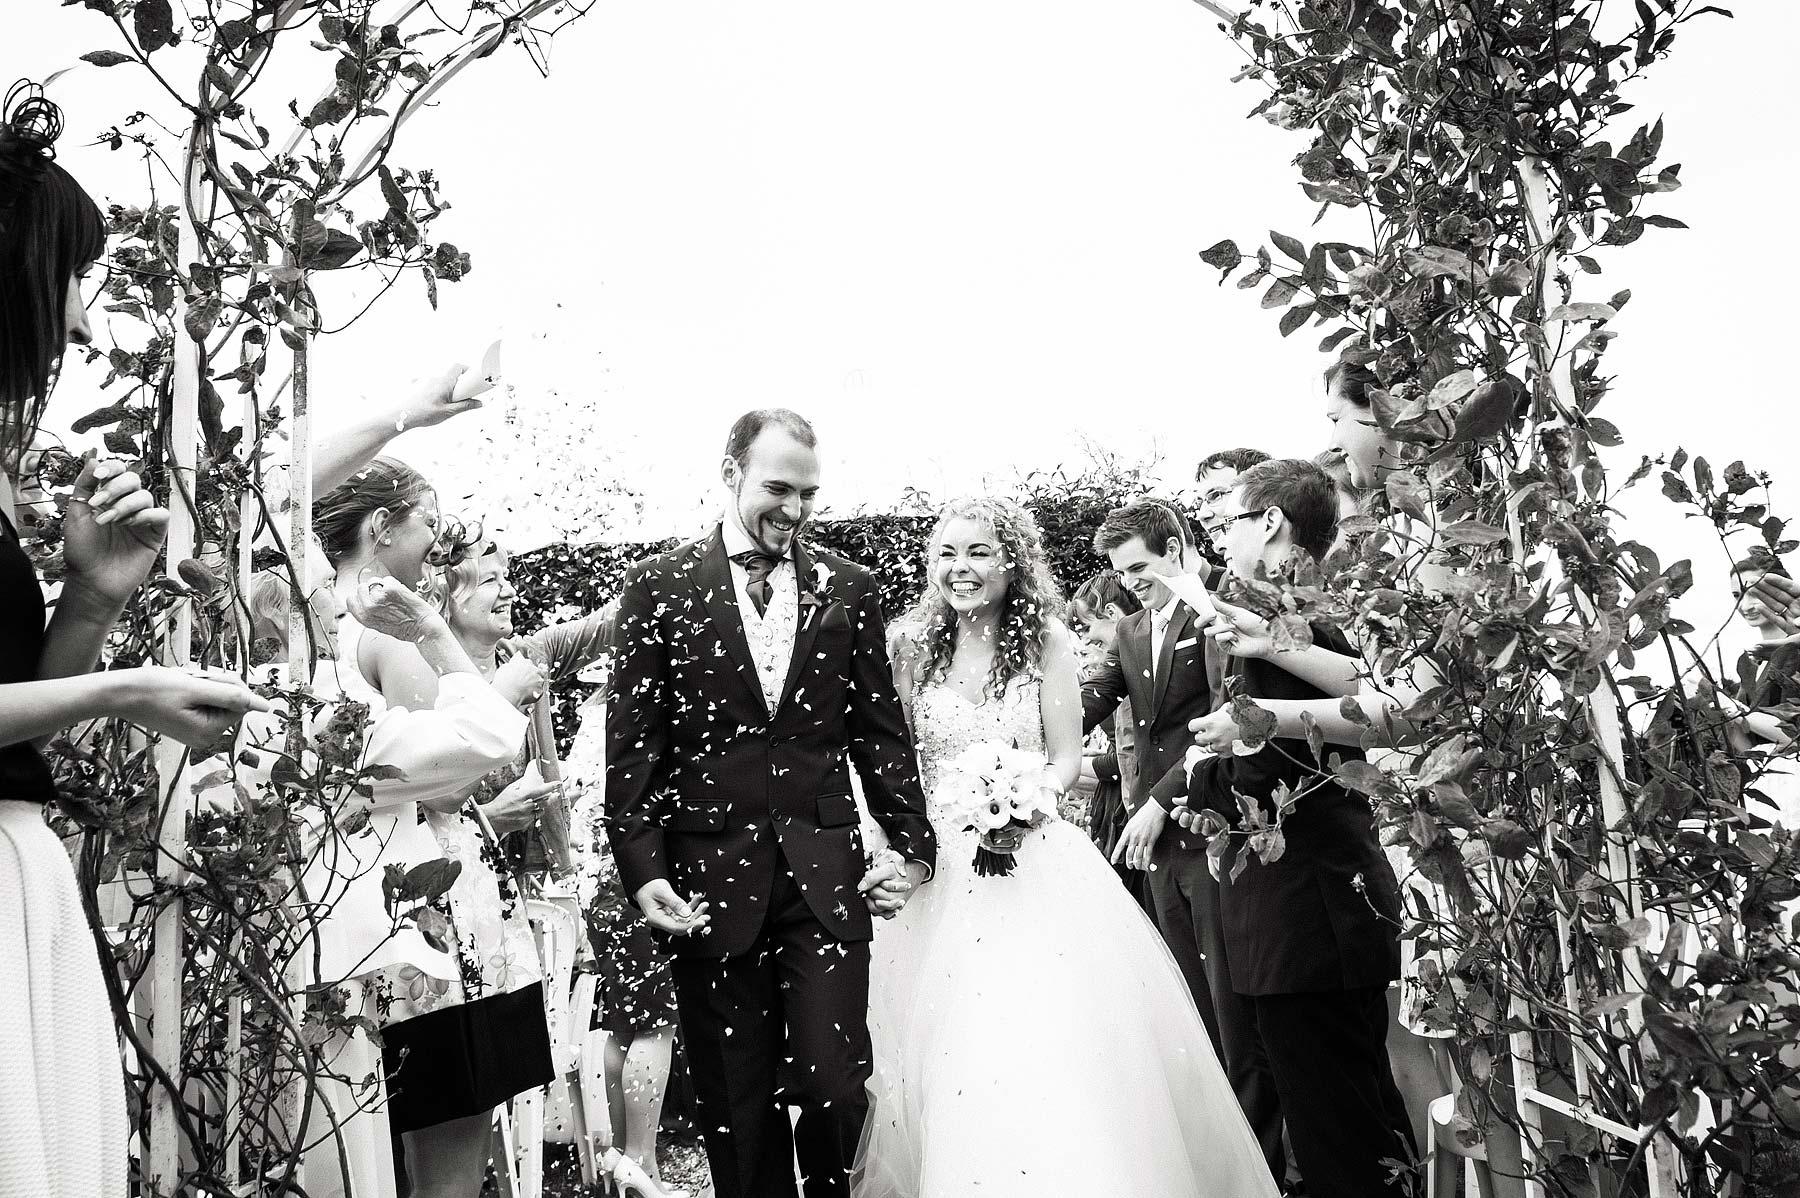 albright-hussey-manor-wedding-photographers-035